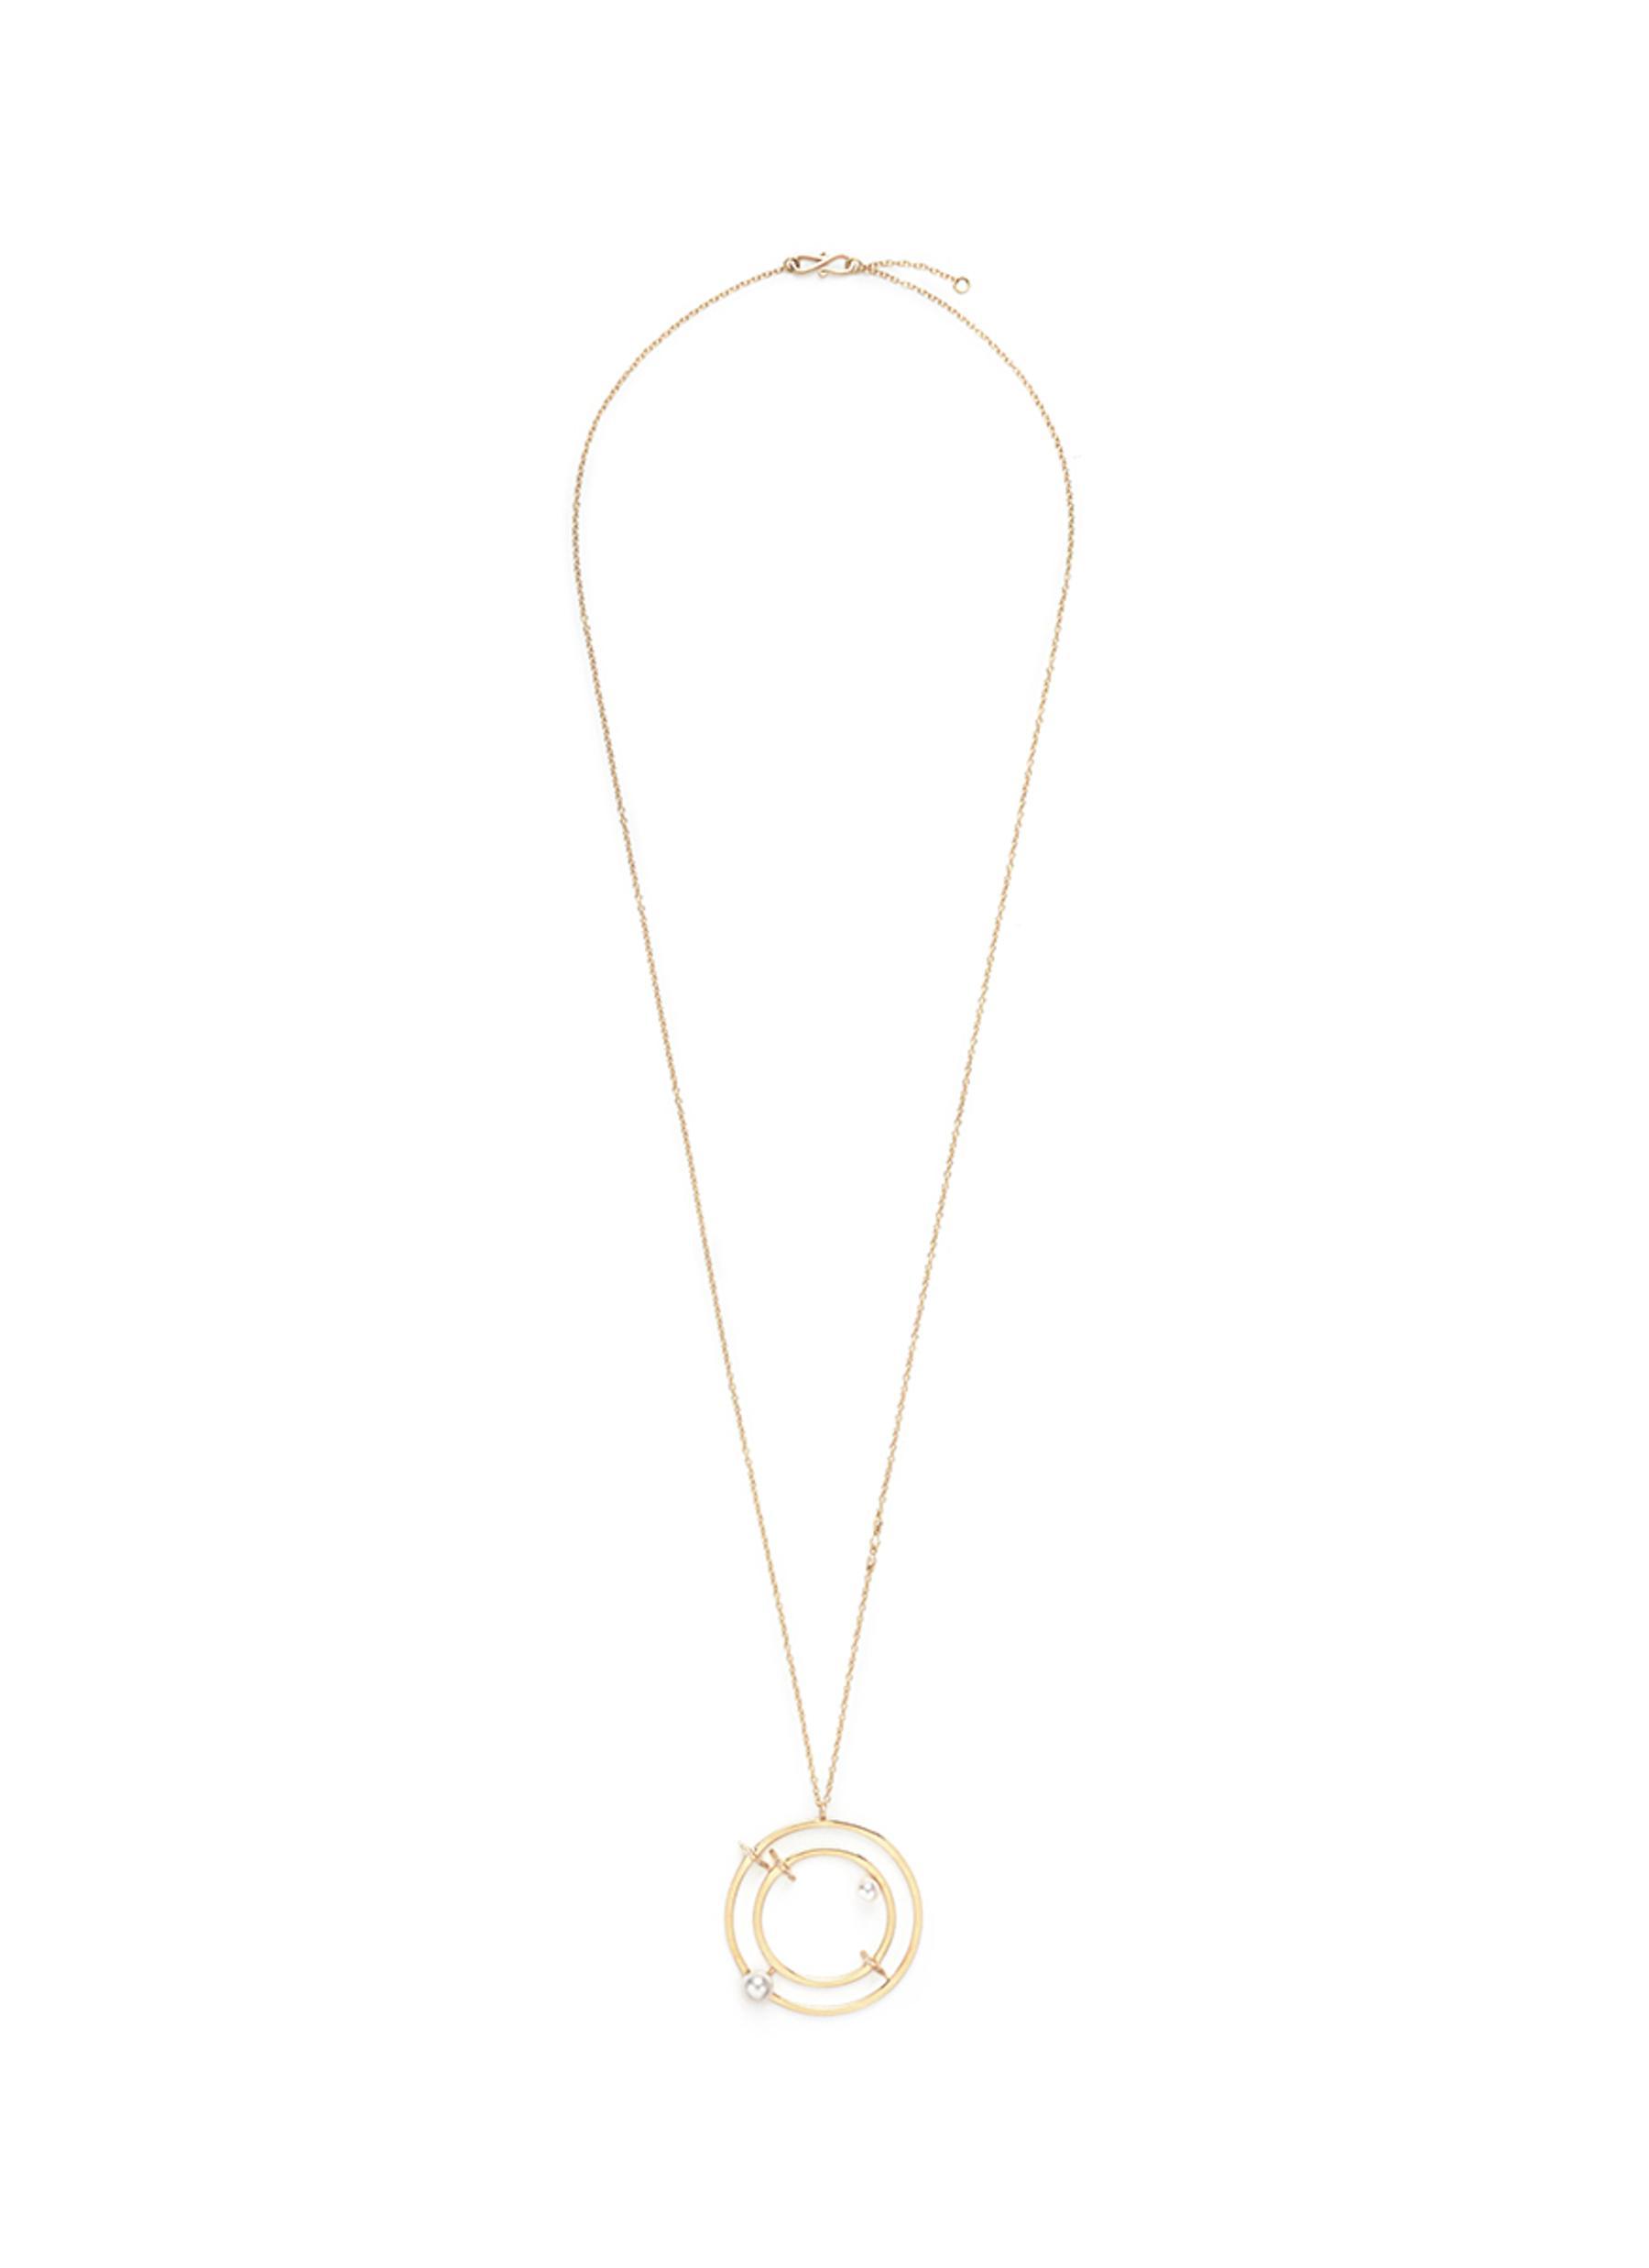 Building Blocks diamond pavé pearl pendant 18k yellow necklace by Phyne By Paige Novick